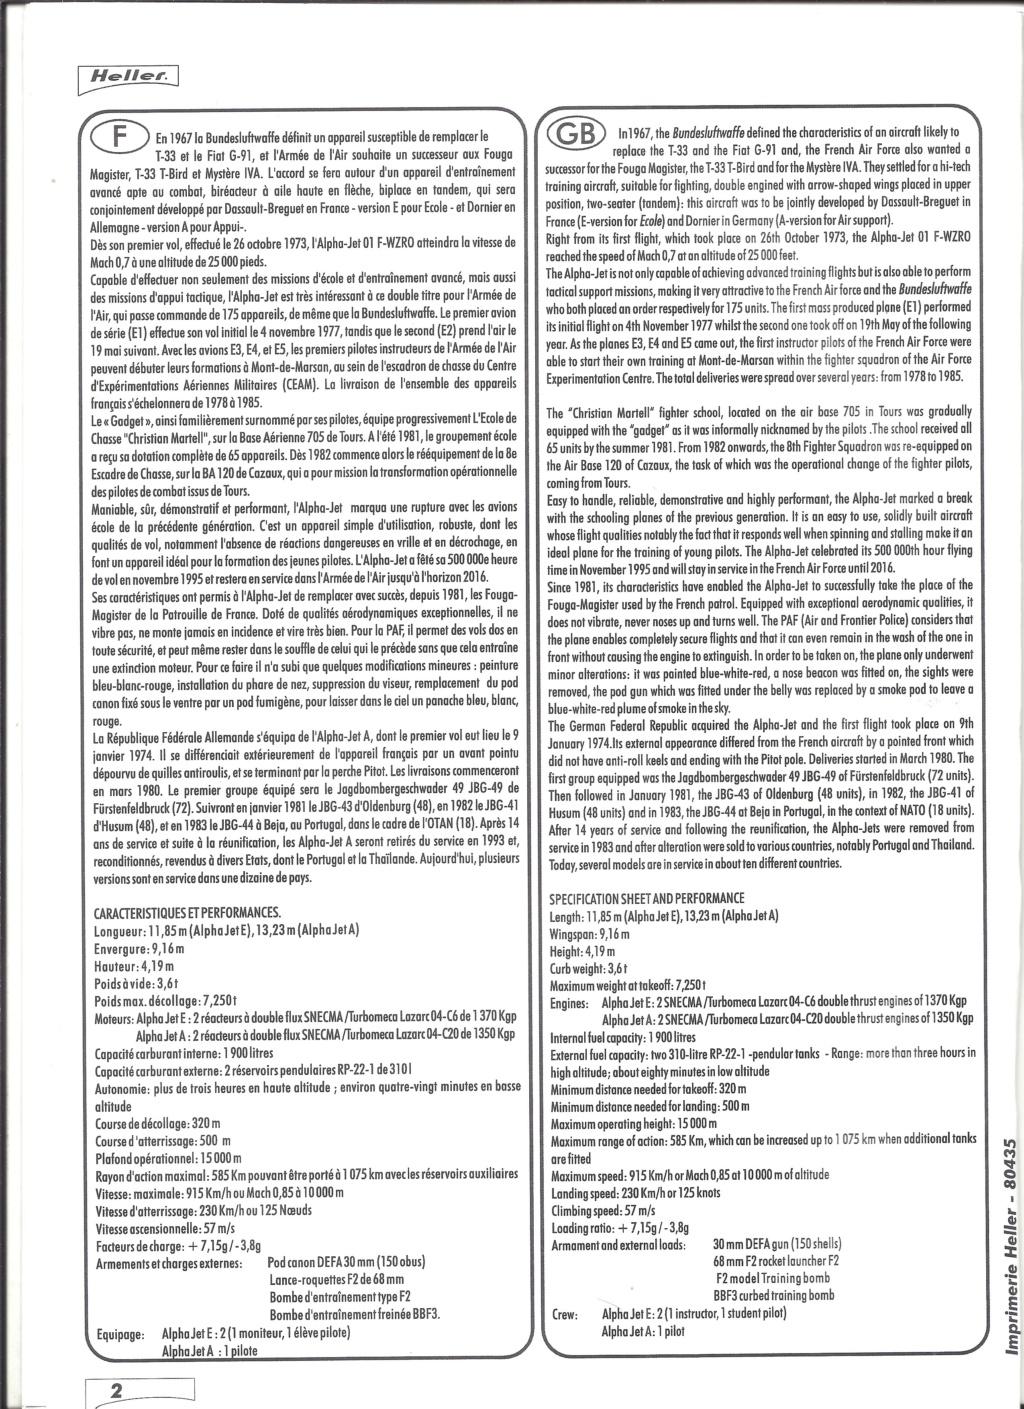 DASSAULT-BREGUET DORNIER ALPHA JET 1/48ème Réf 80435 Notice Helle657